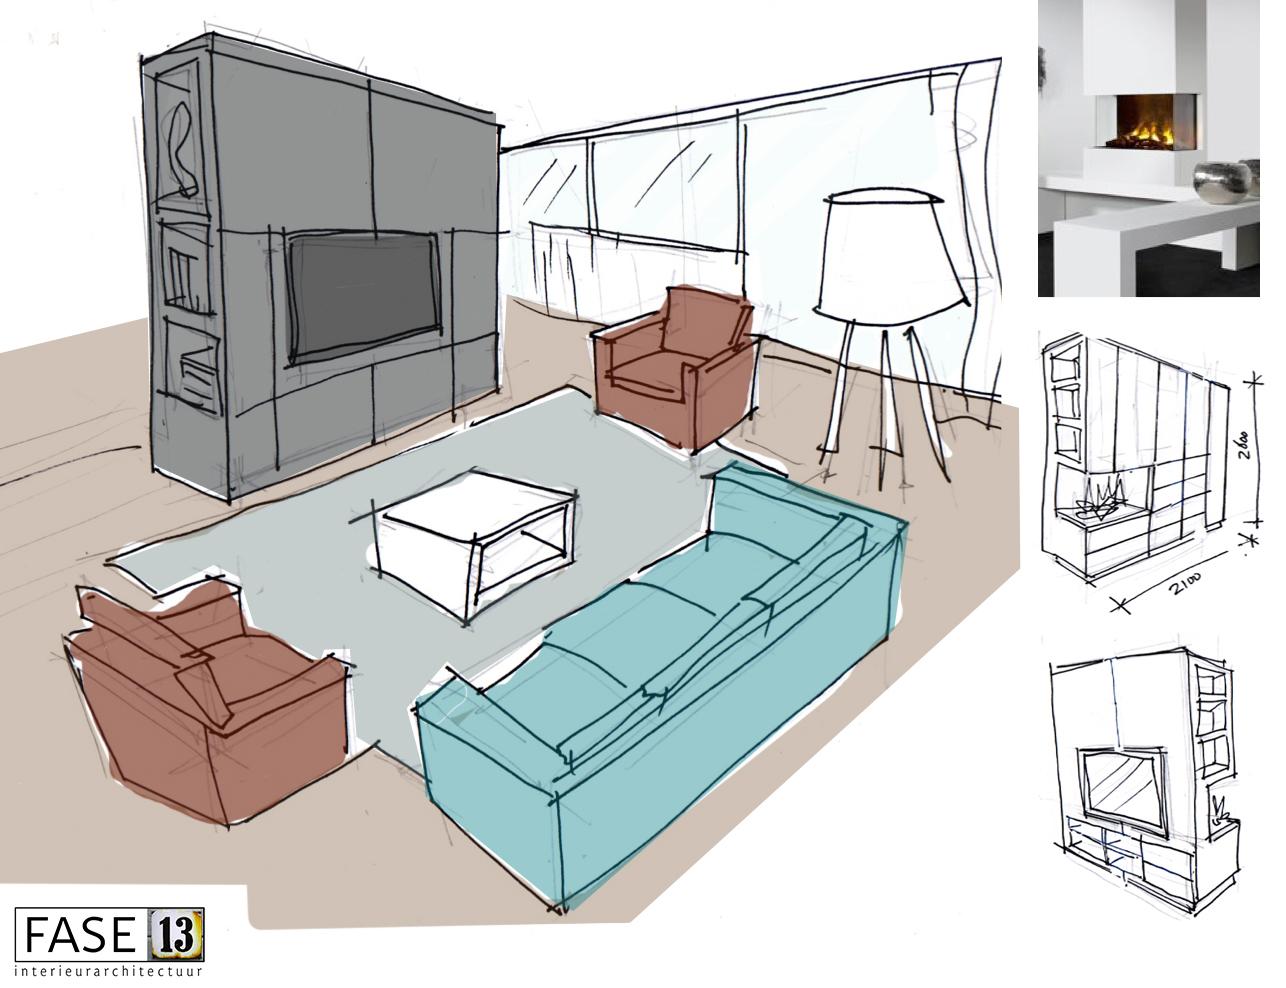 Sneak preview totaal interieurontwerp nieuwbouw appartement fase13 interieurarchitectuur for Interieurontwerp